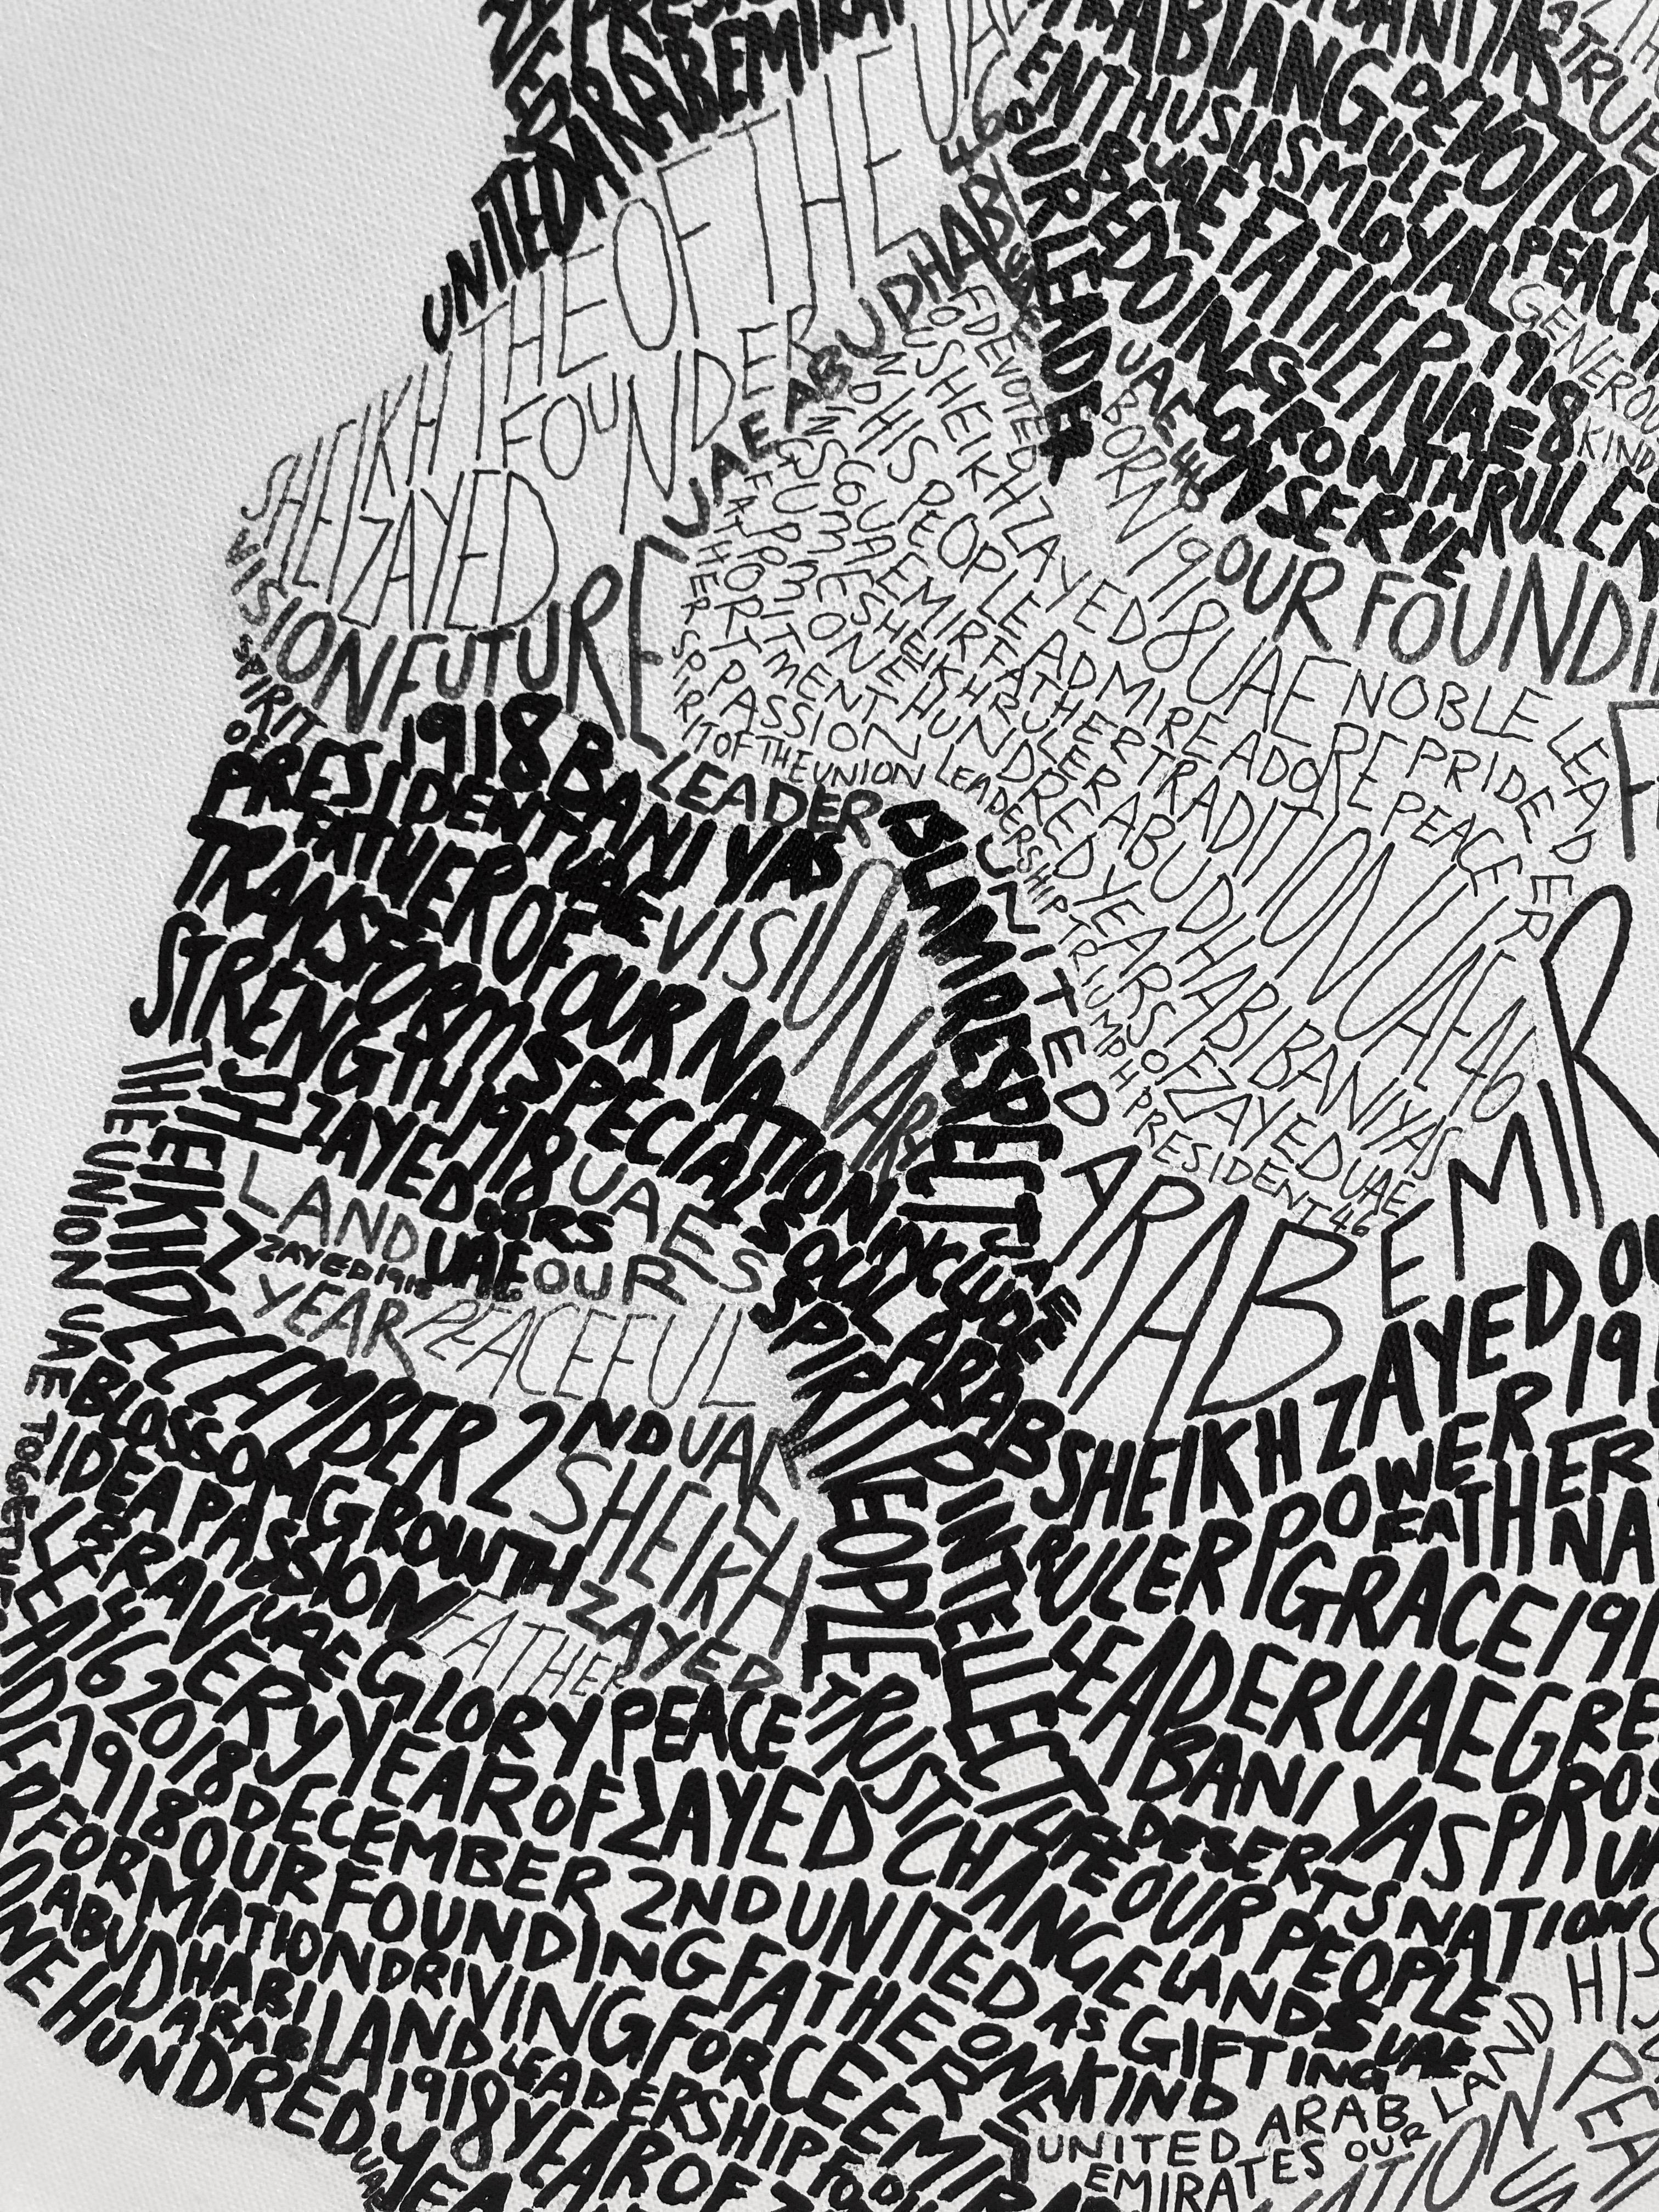 Story Of A Leader 2 Natalie Daghestani Art Dubai Artist BSAB 4